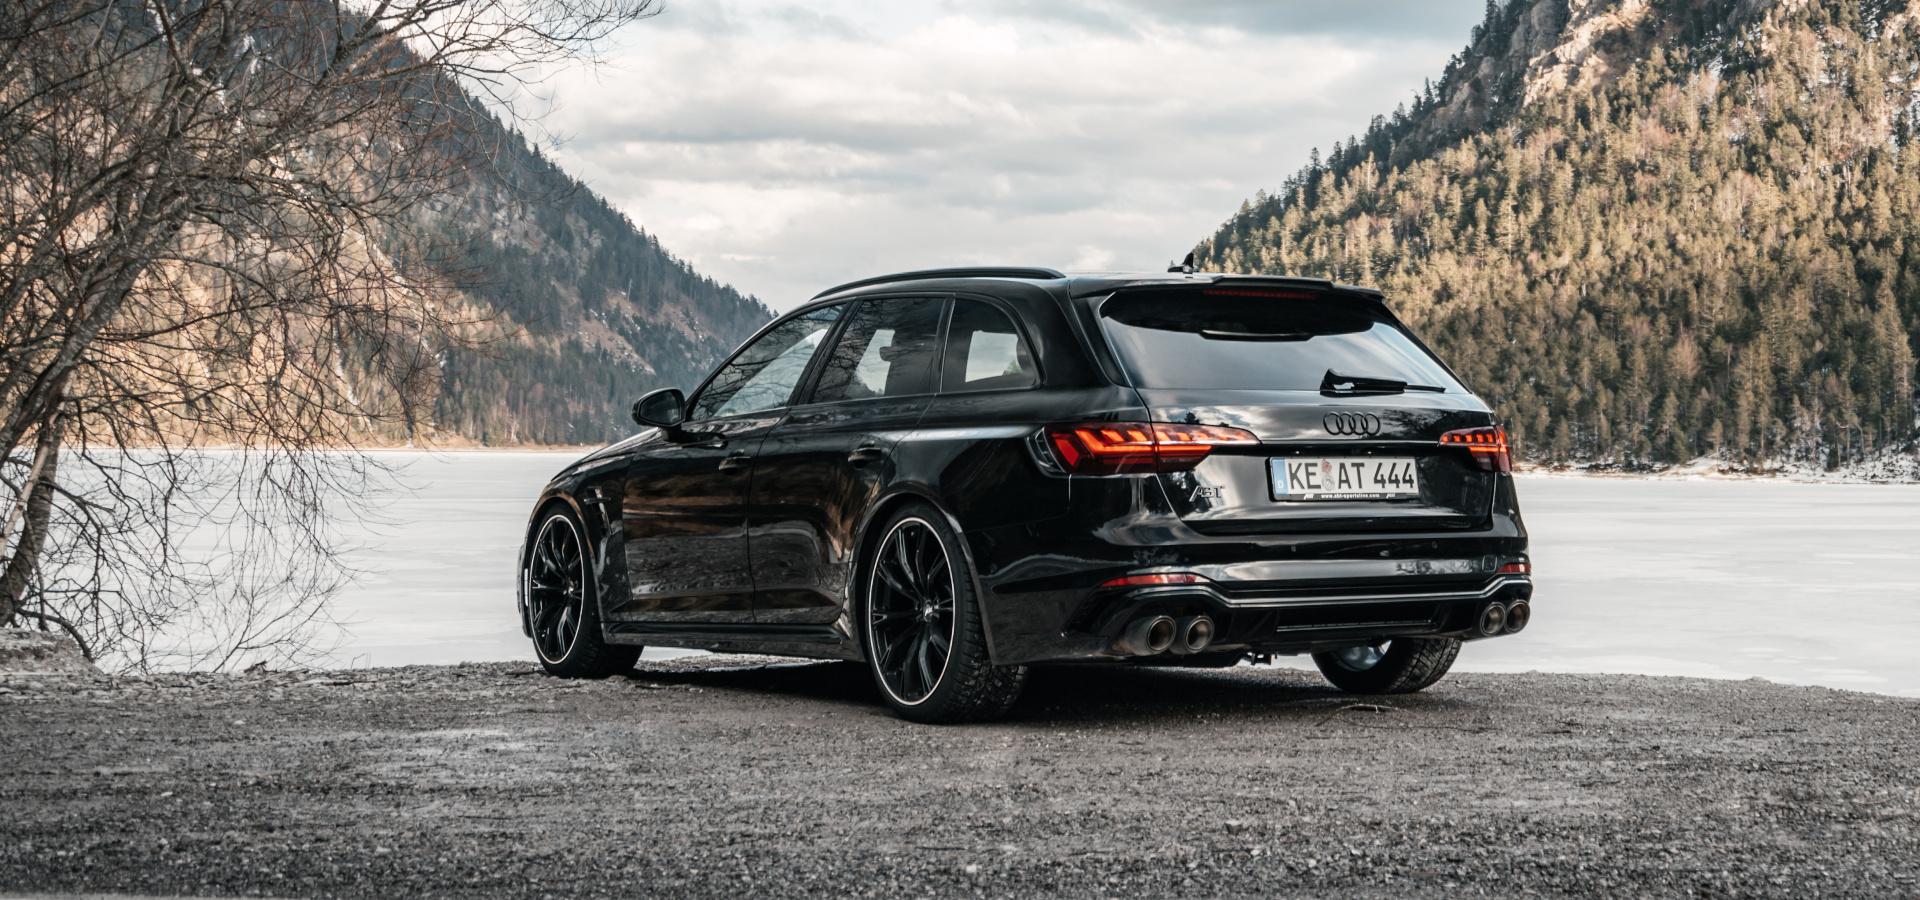 Kekurangan Audi A4 Rs Harga